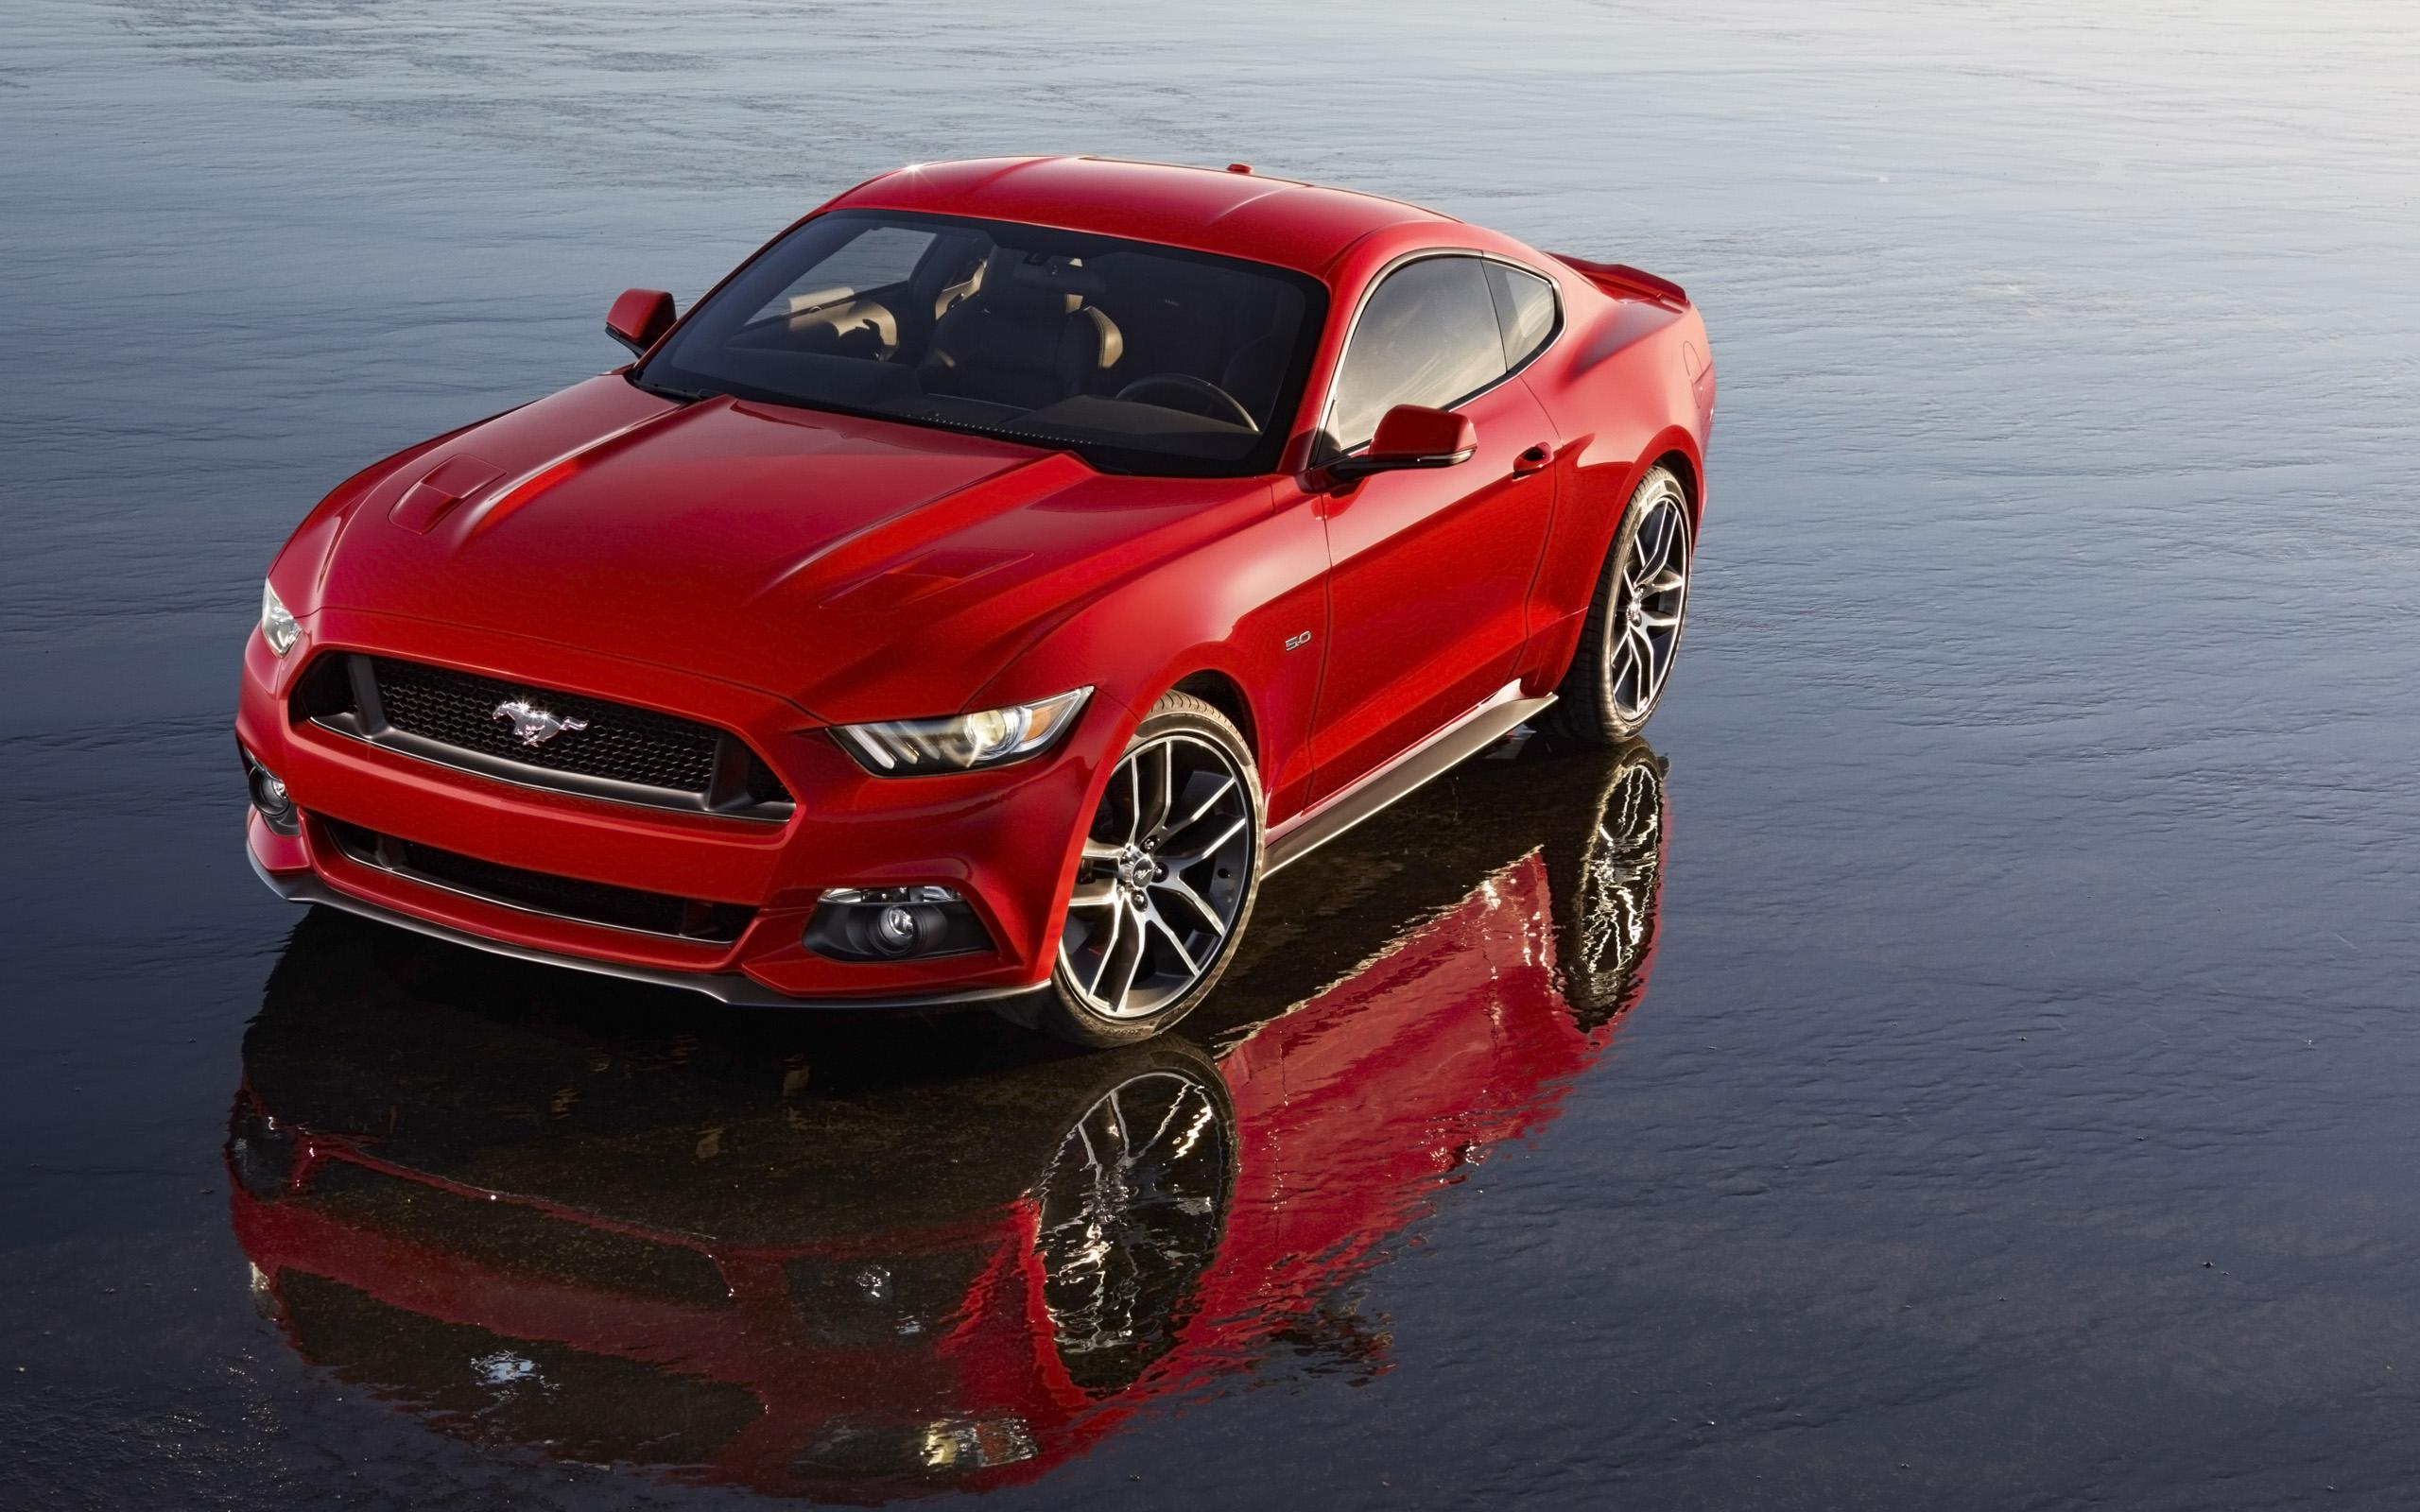 2015 Ford Mustang Wallpaper Hd Car Wallpapers Id 3938